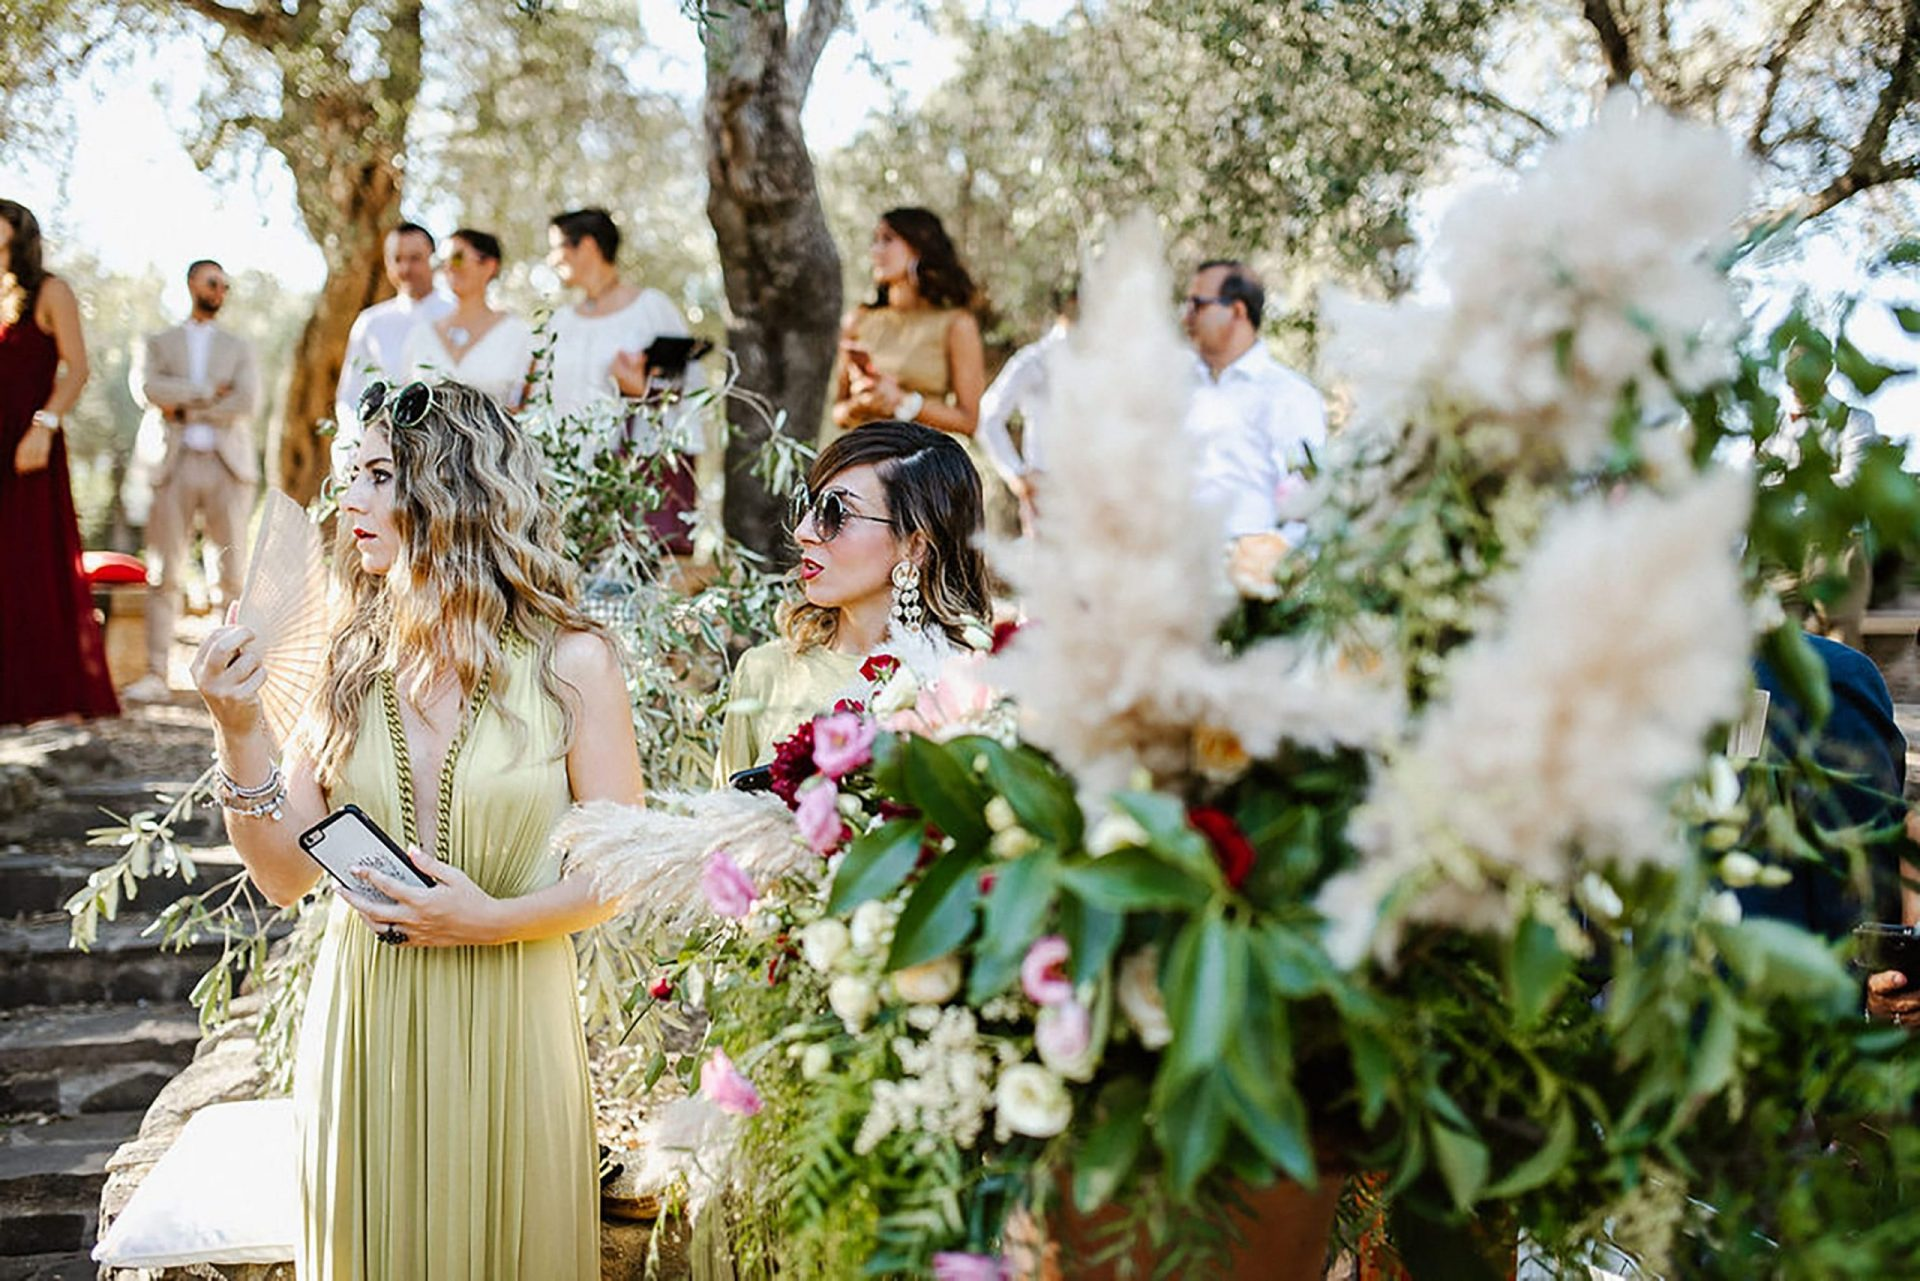 Marianna & Matteo, country syle wedding ceremony